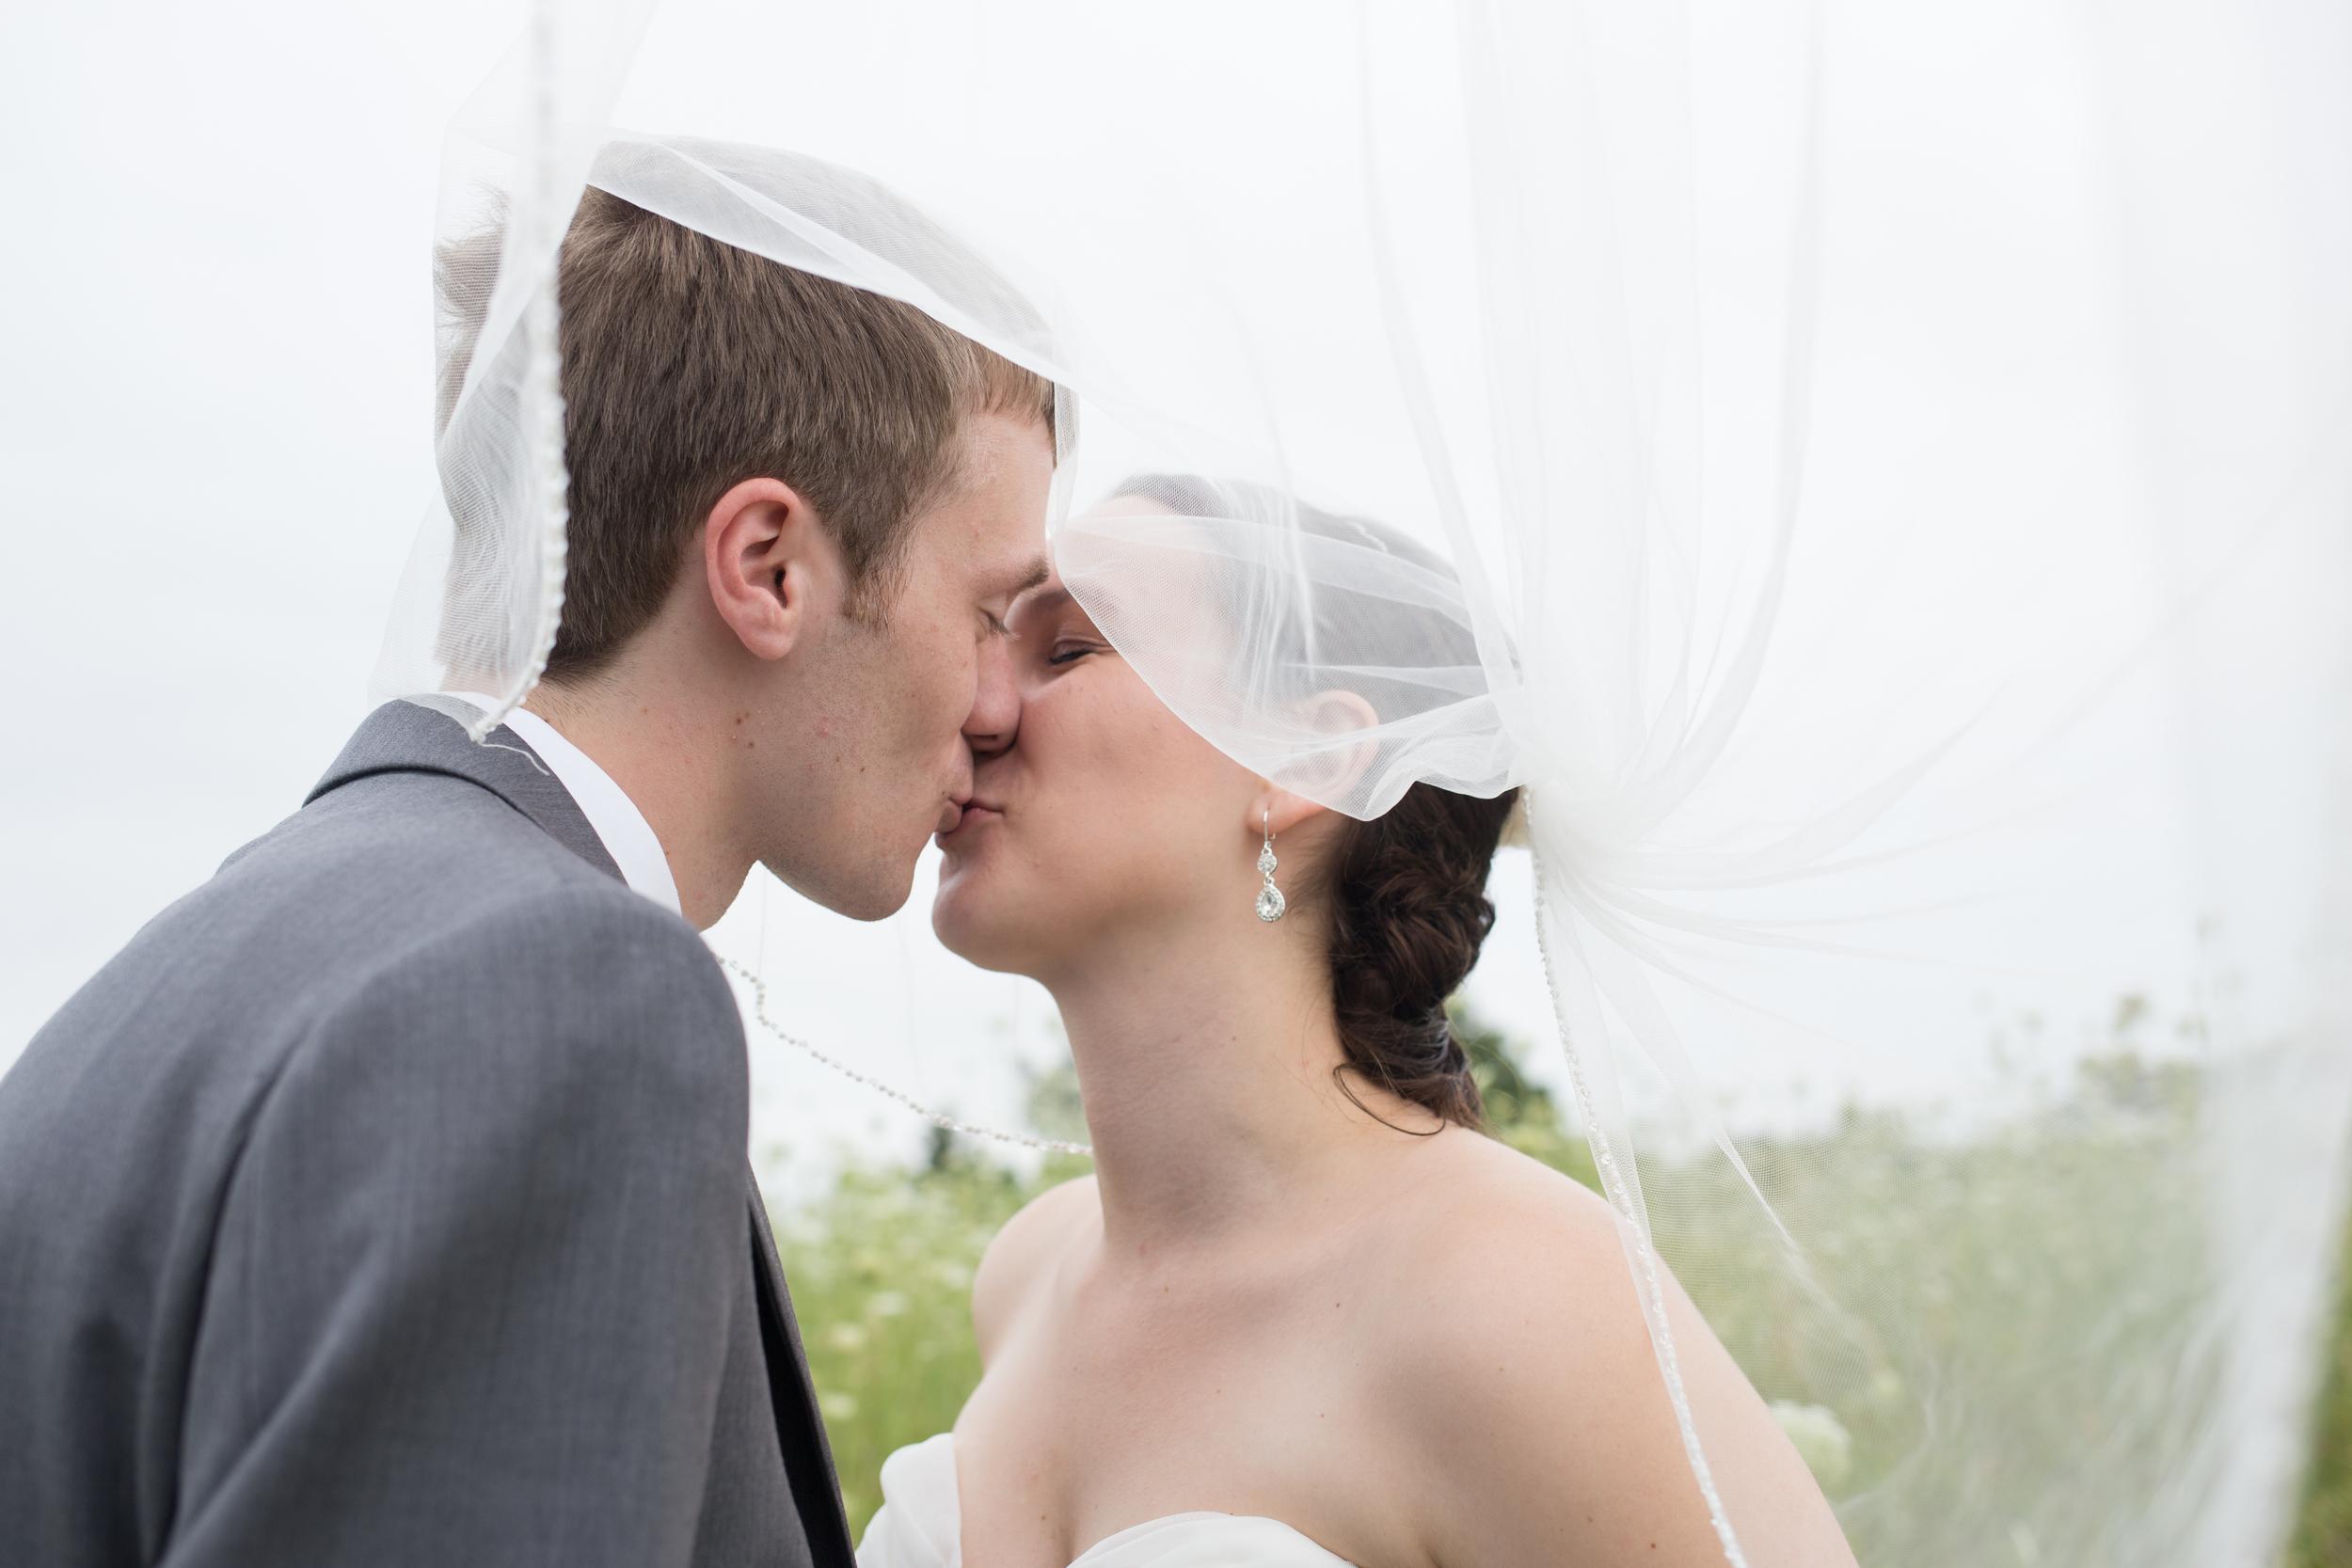 Plamann Park Wedding Photo - Appleton Wisconsin Wedding Photographer -Whit Meza Photography